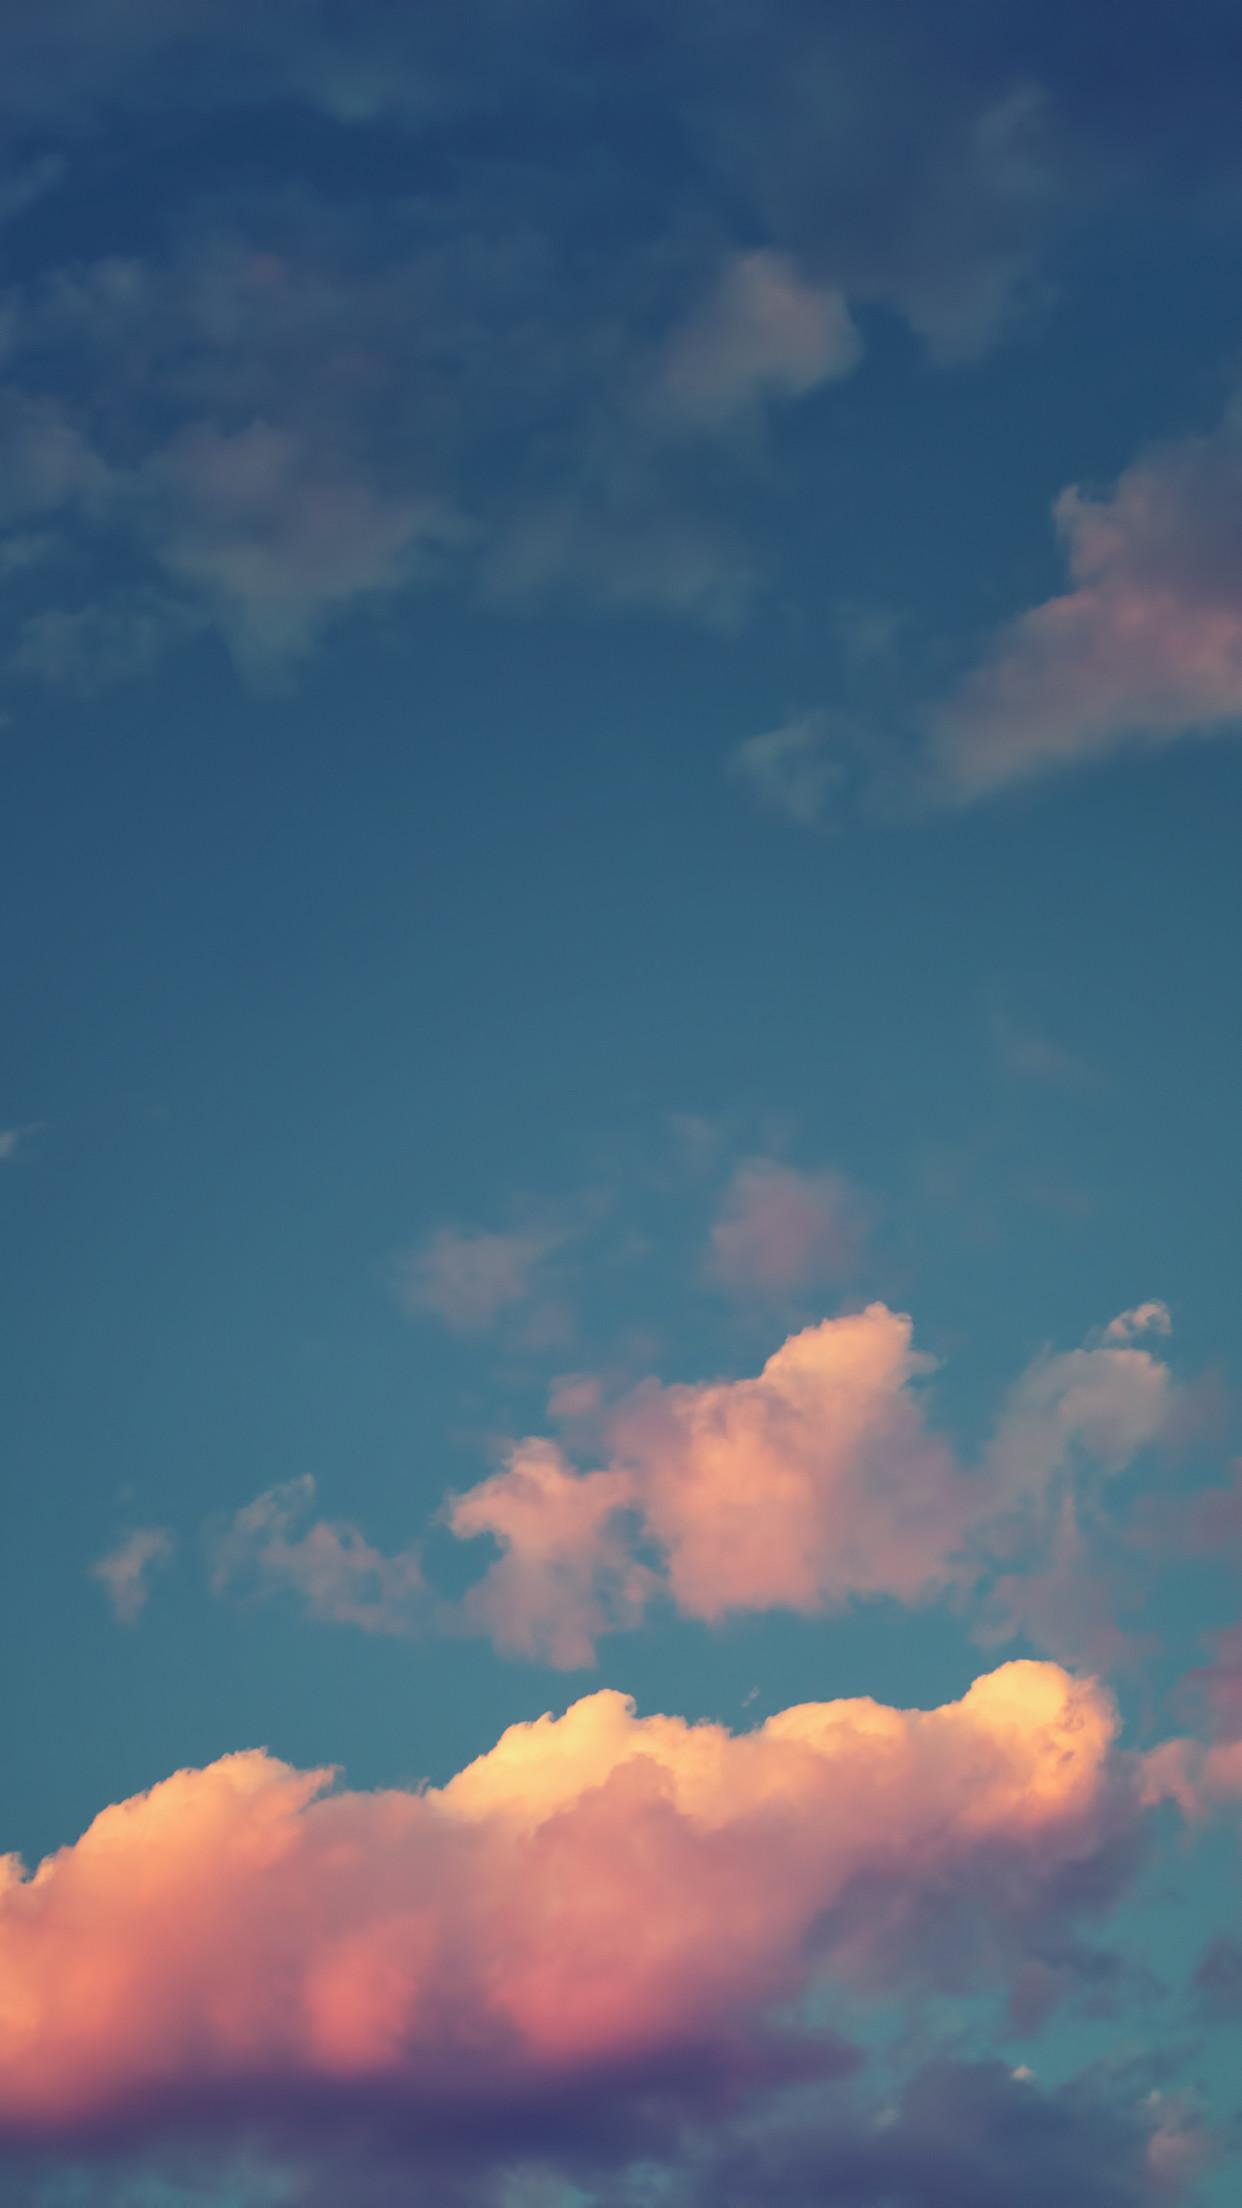 Cloud 9 Iphone Wallpaper 73 Images